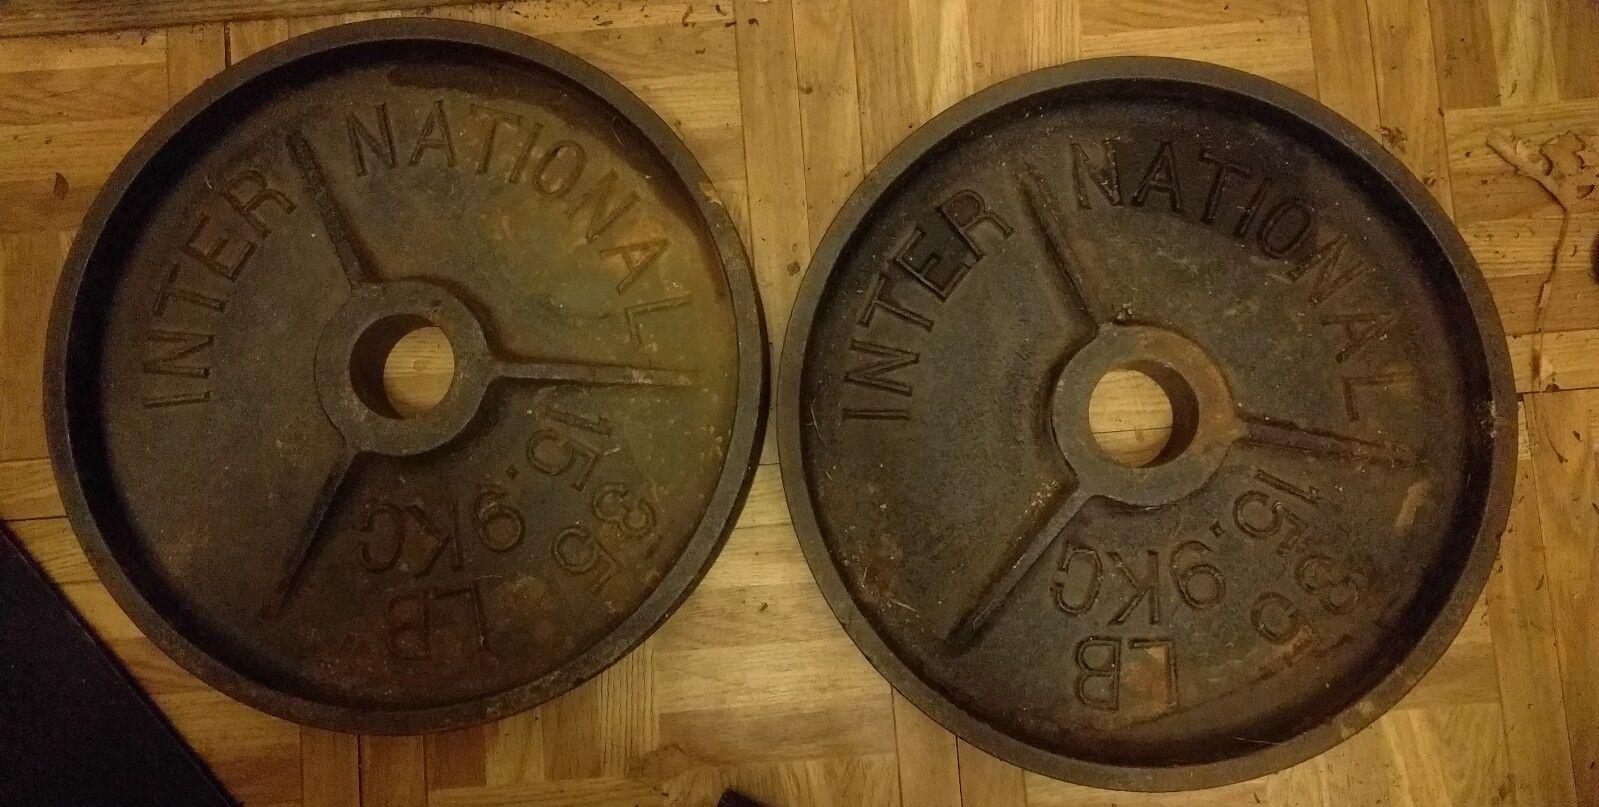 International Pair DEEP DISH RARE Olympic 35 lb Weight Plates Pair International 2